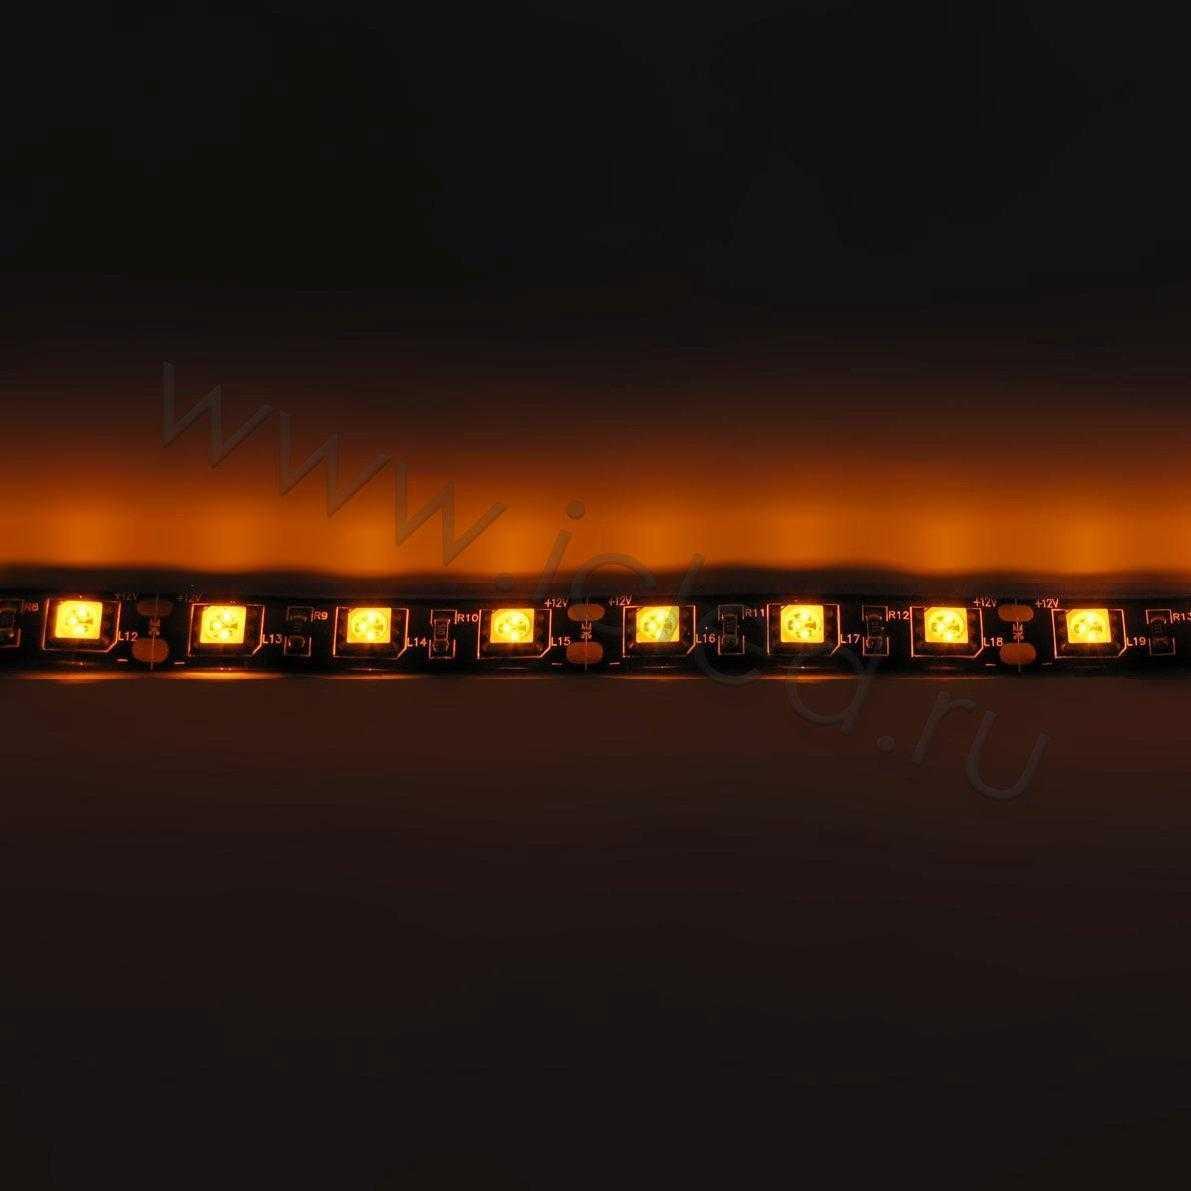 Светодиодная лента Class B, 5050, 60led/m, Yellow, 12V, IP65 (черный шлейф)